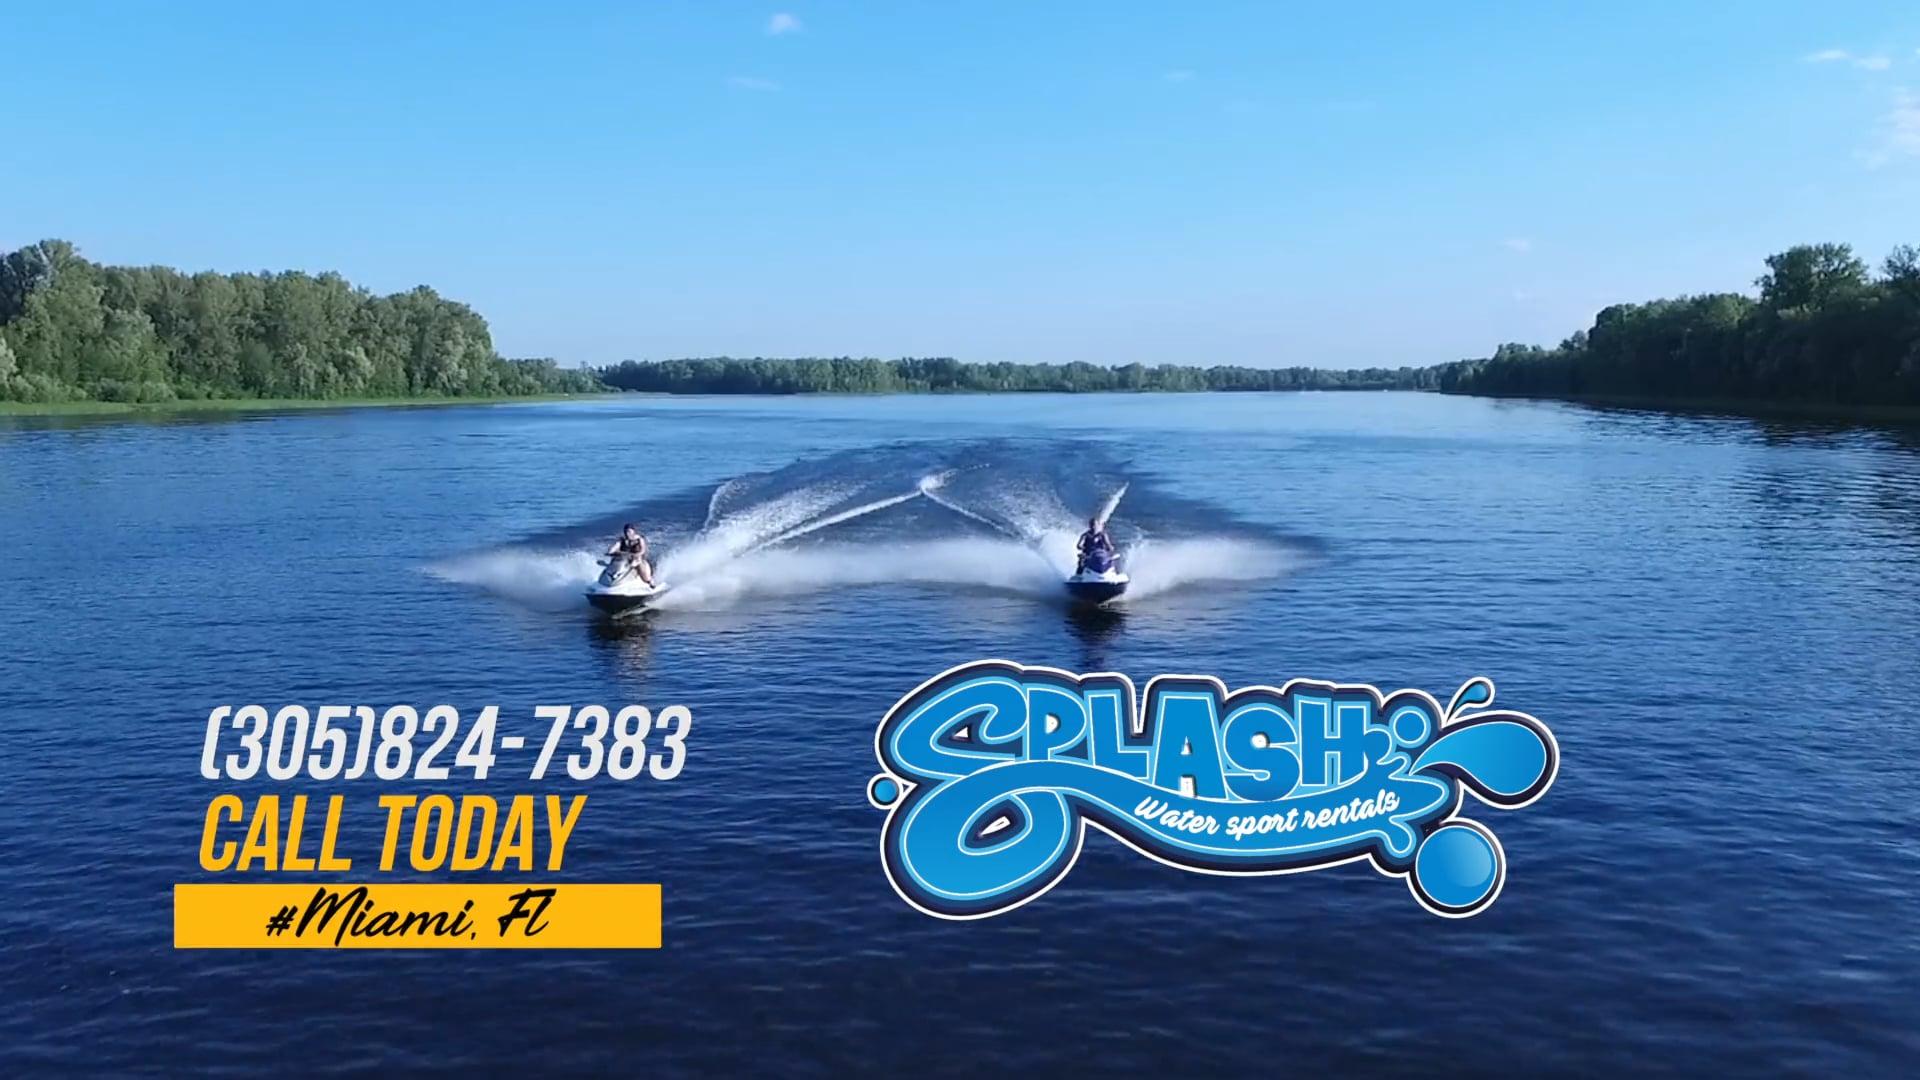 Splash Water Sport Rentals